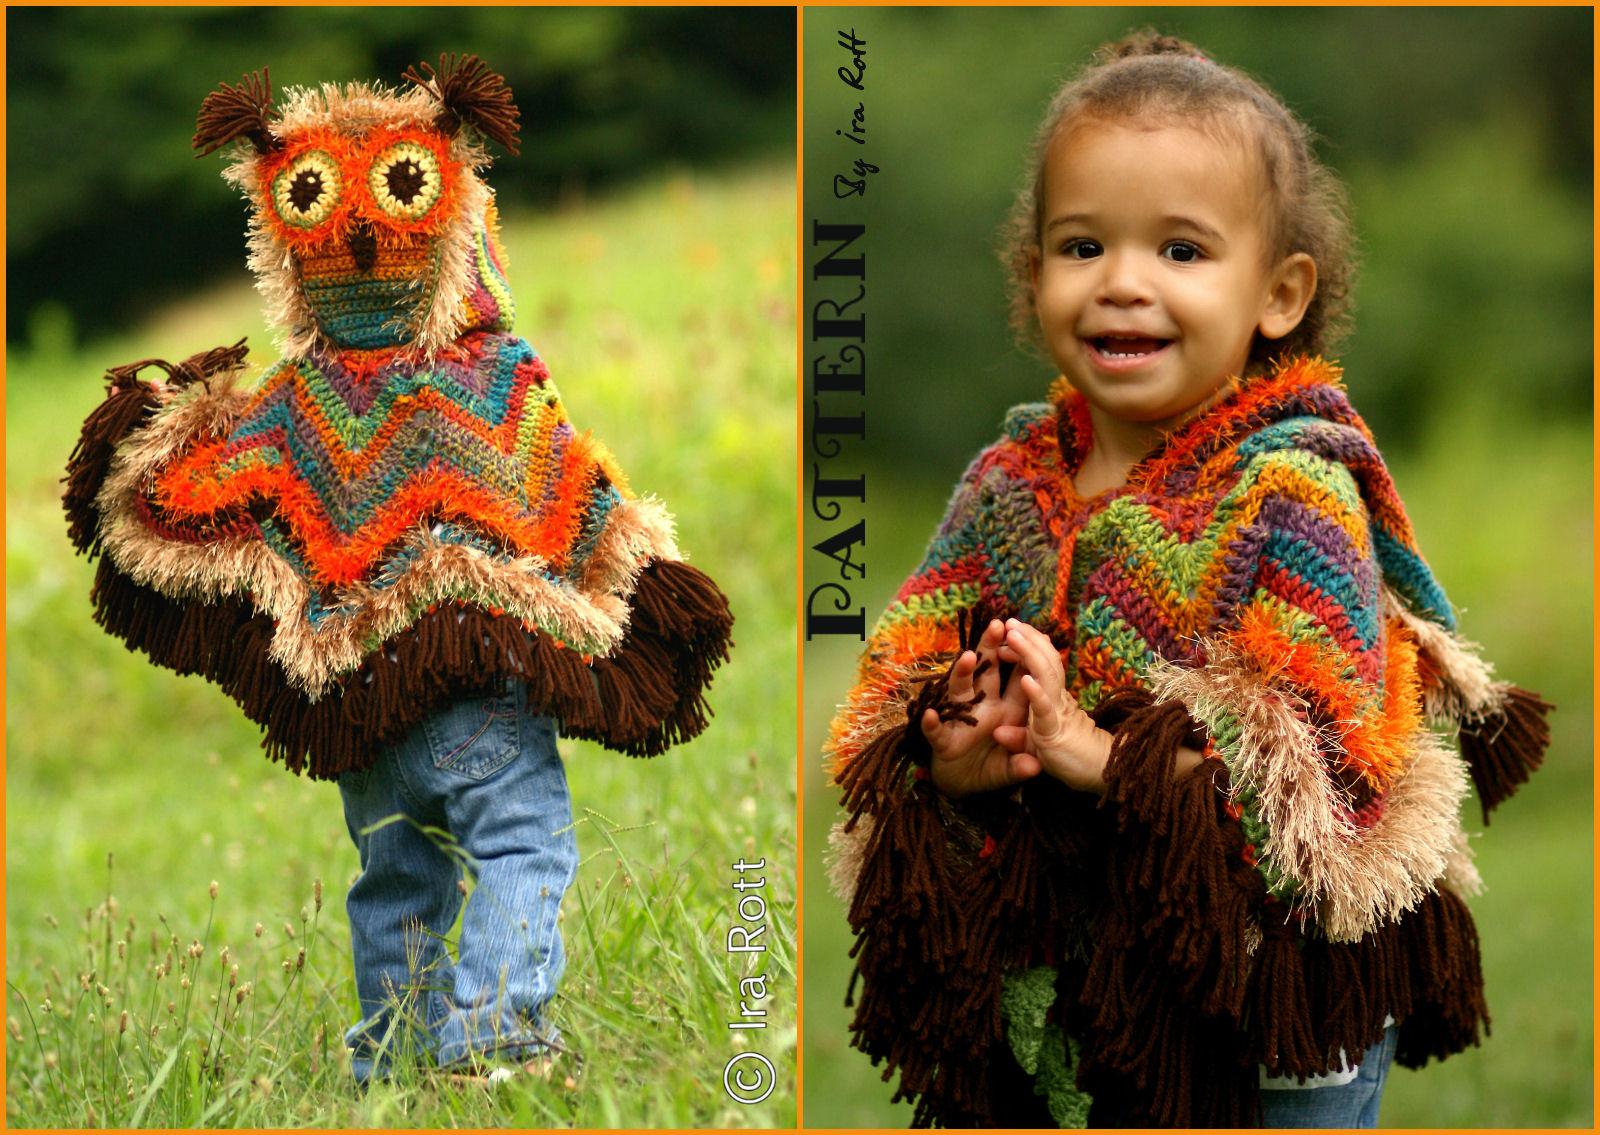 a595547cb1c Fashion Crochet Design By Ira Rott  2012